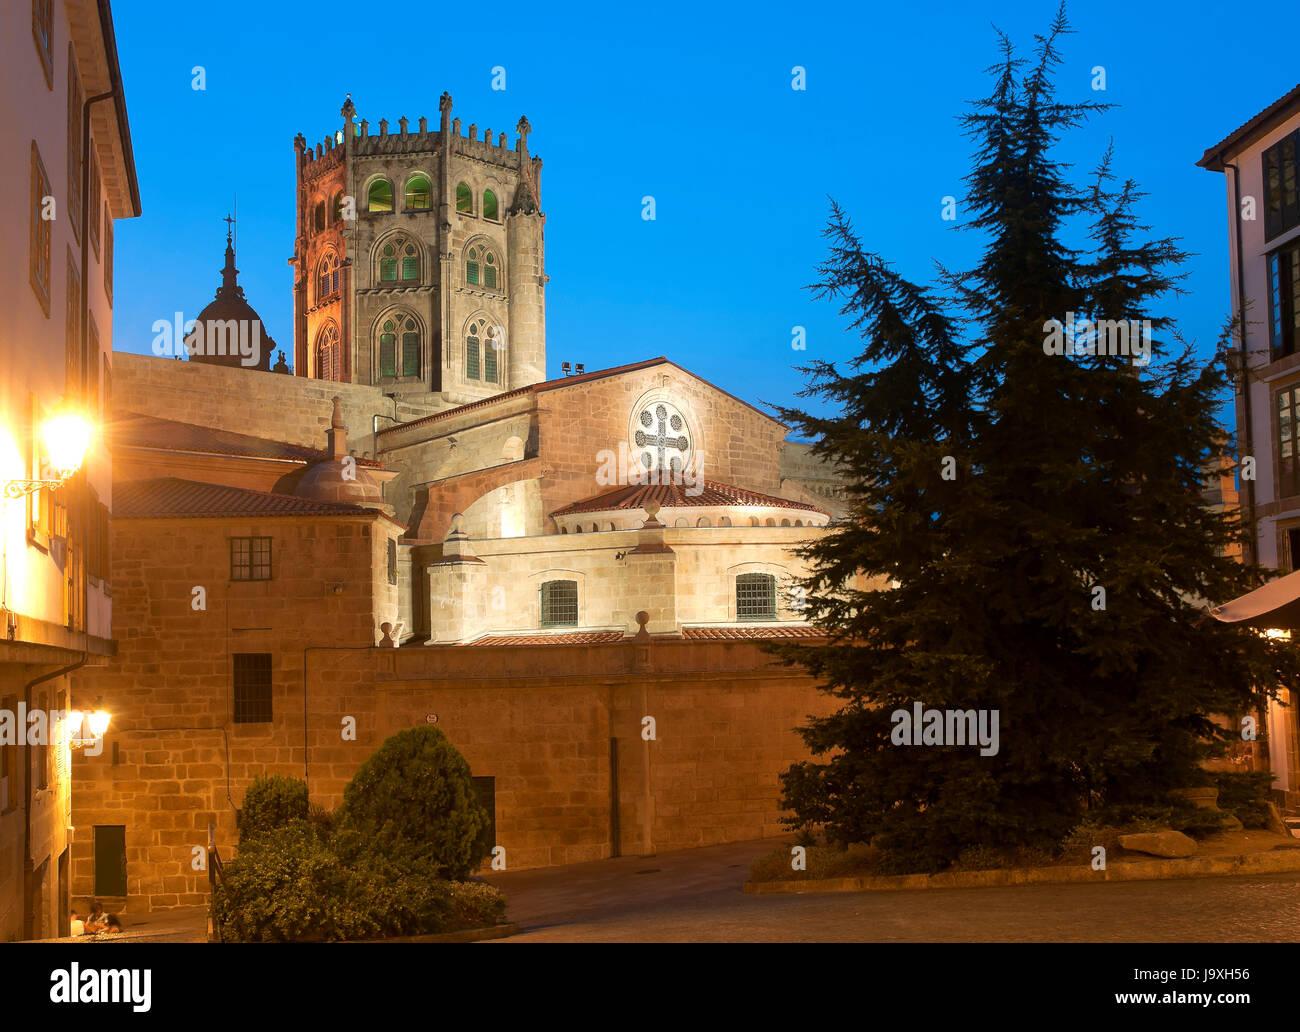 Gothic Cathedral of San Martin de Tours - 12th century, Orense, Region of Galicia, Spain, Europe - Stock Image